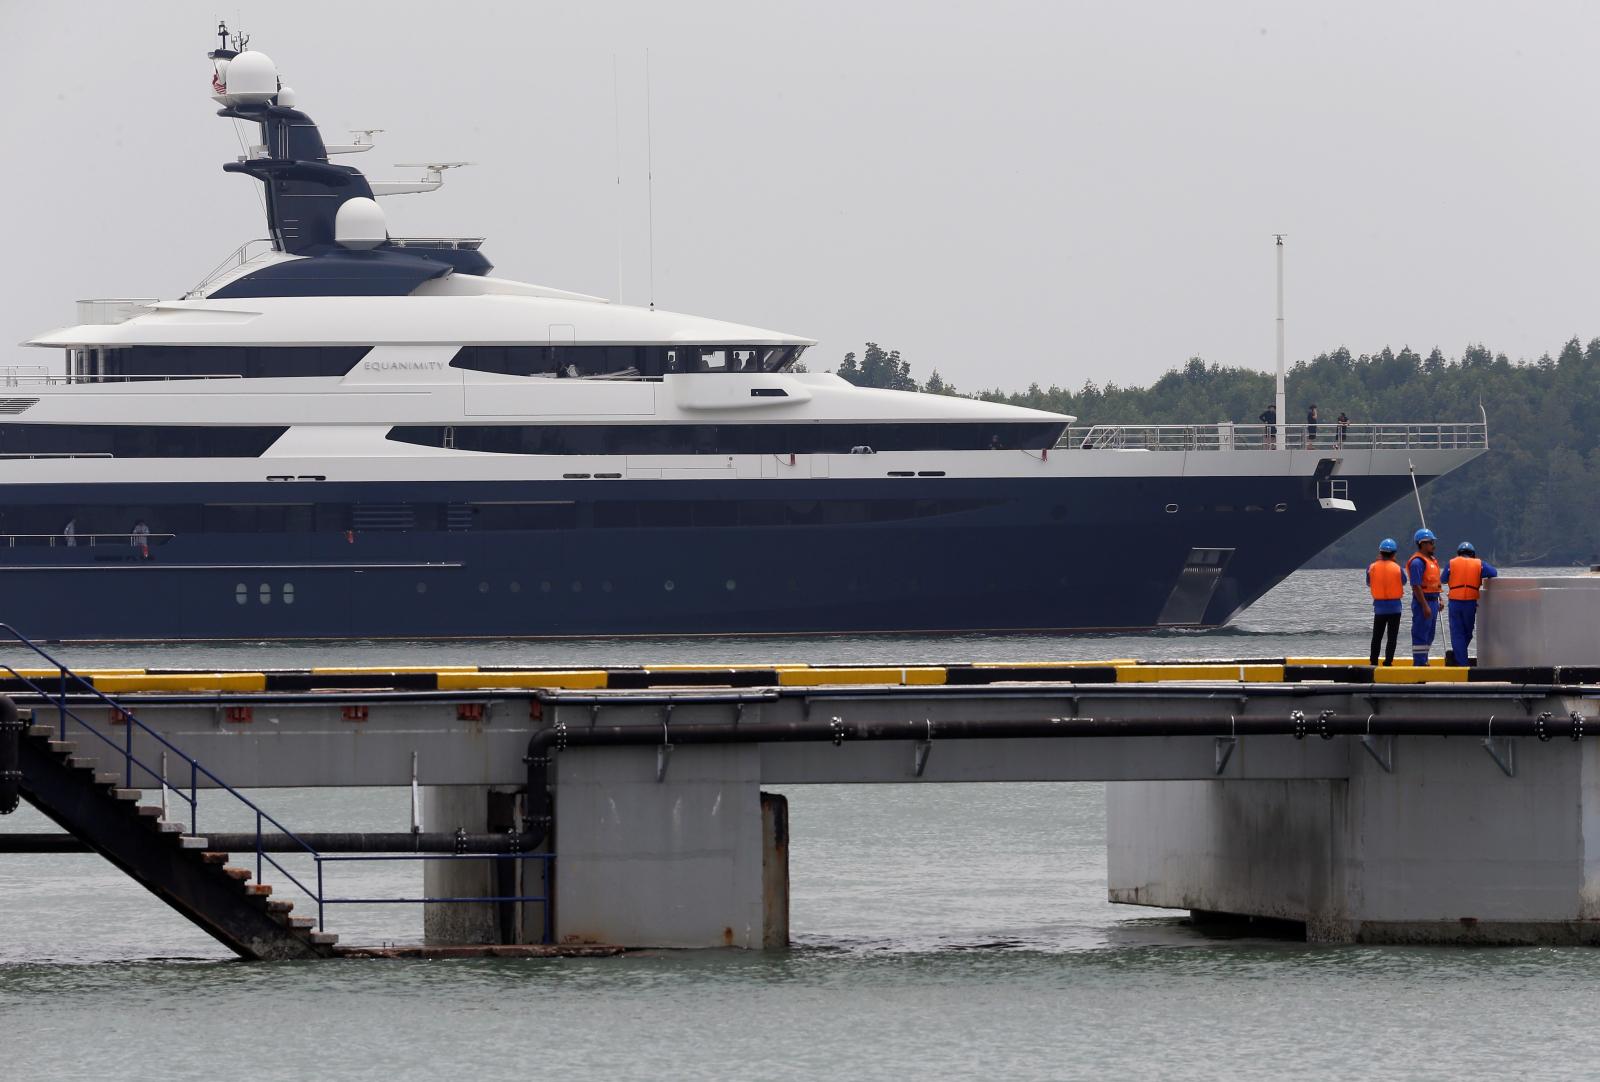 Seized luxury yacht Equanimity